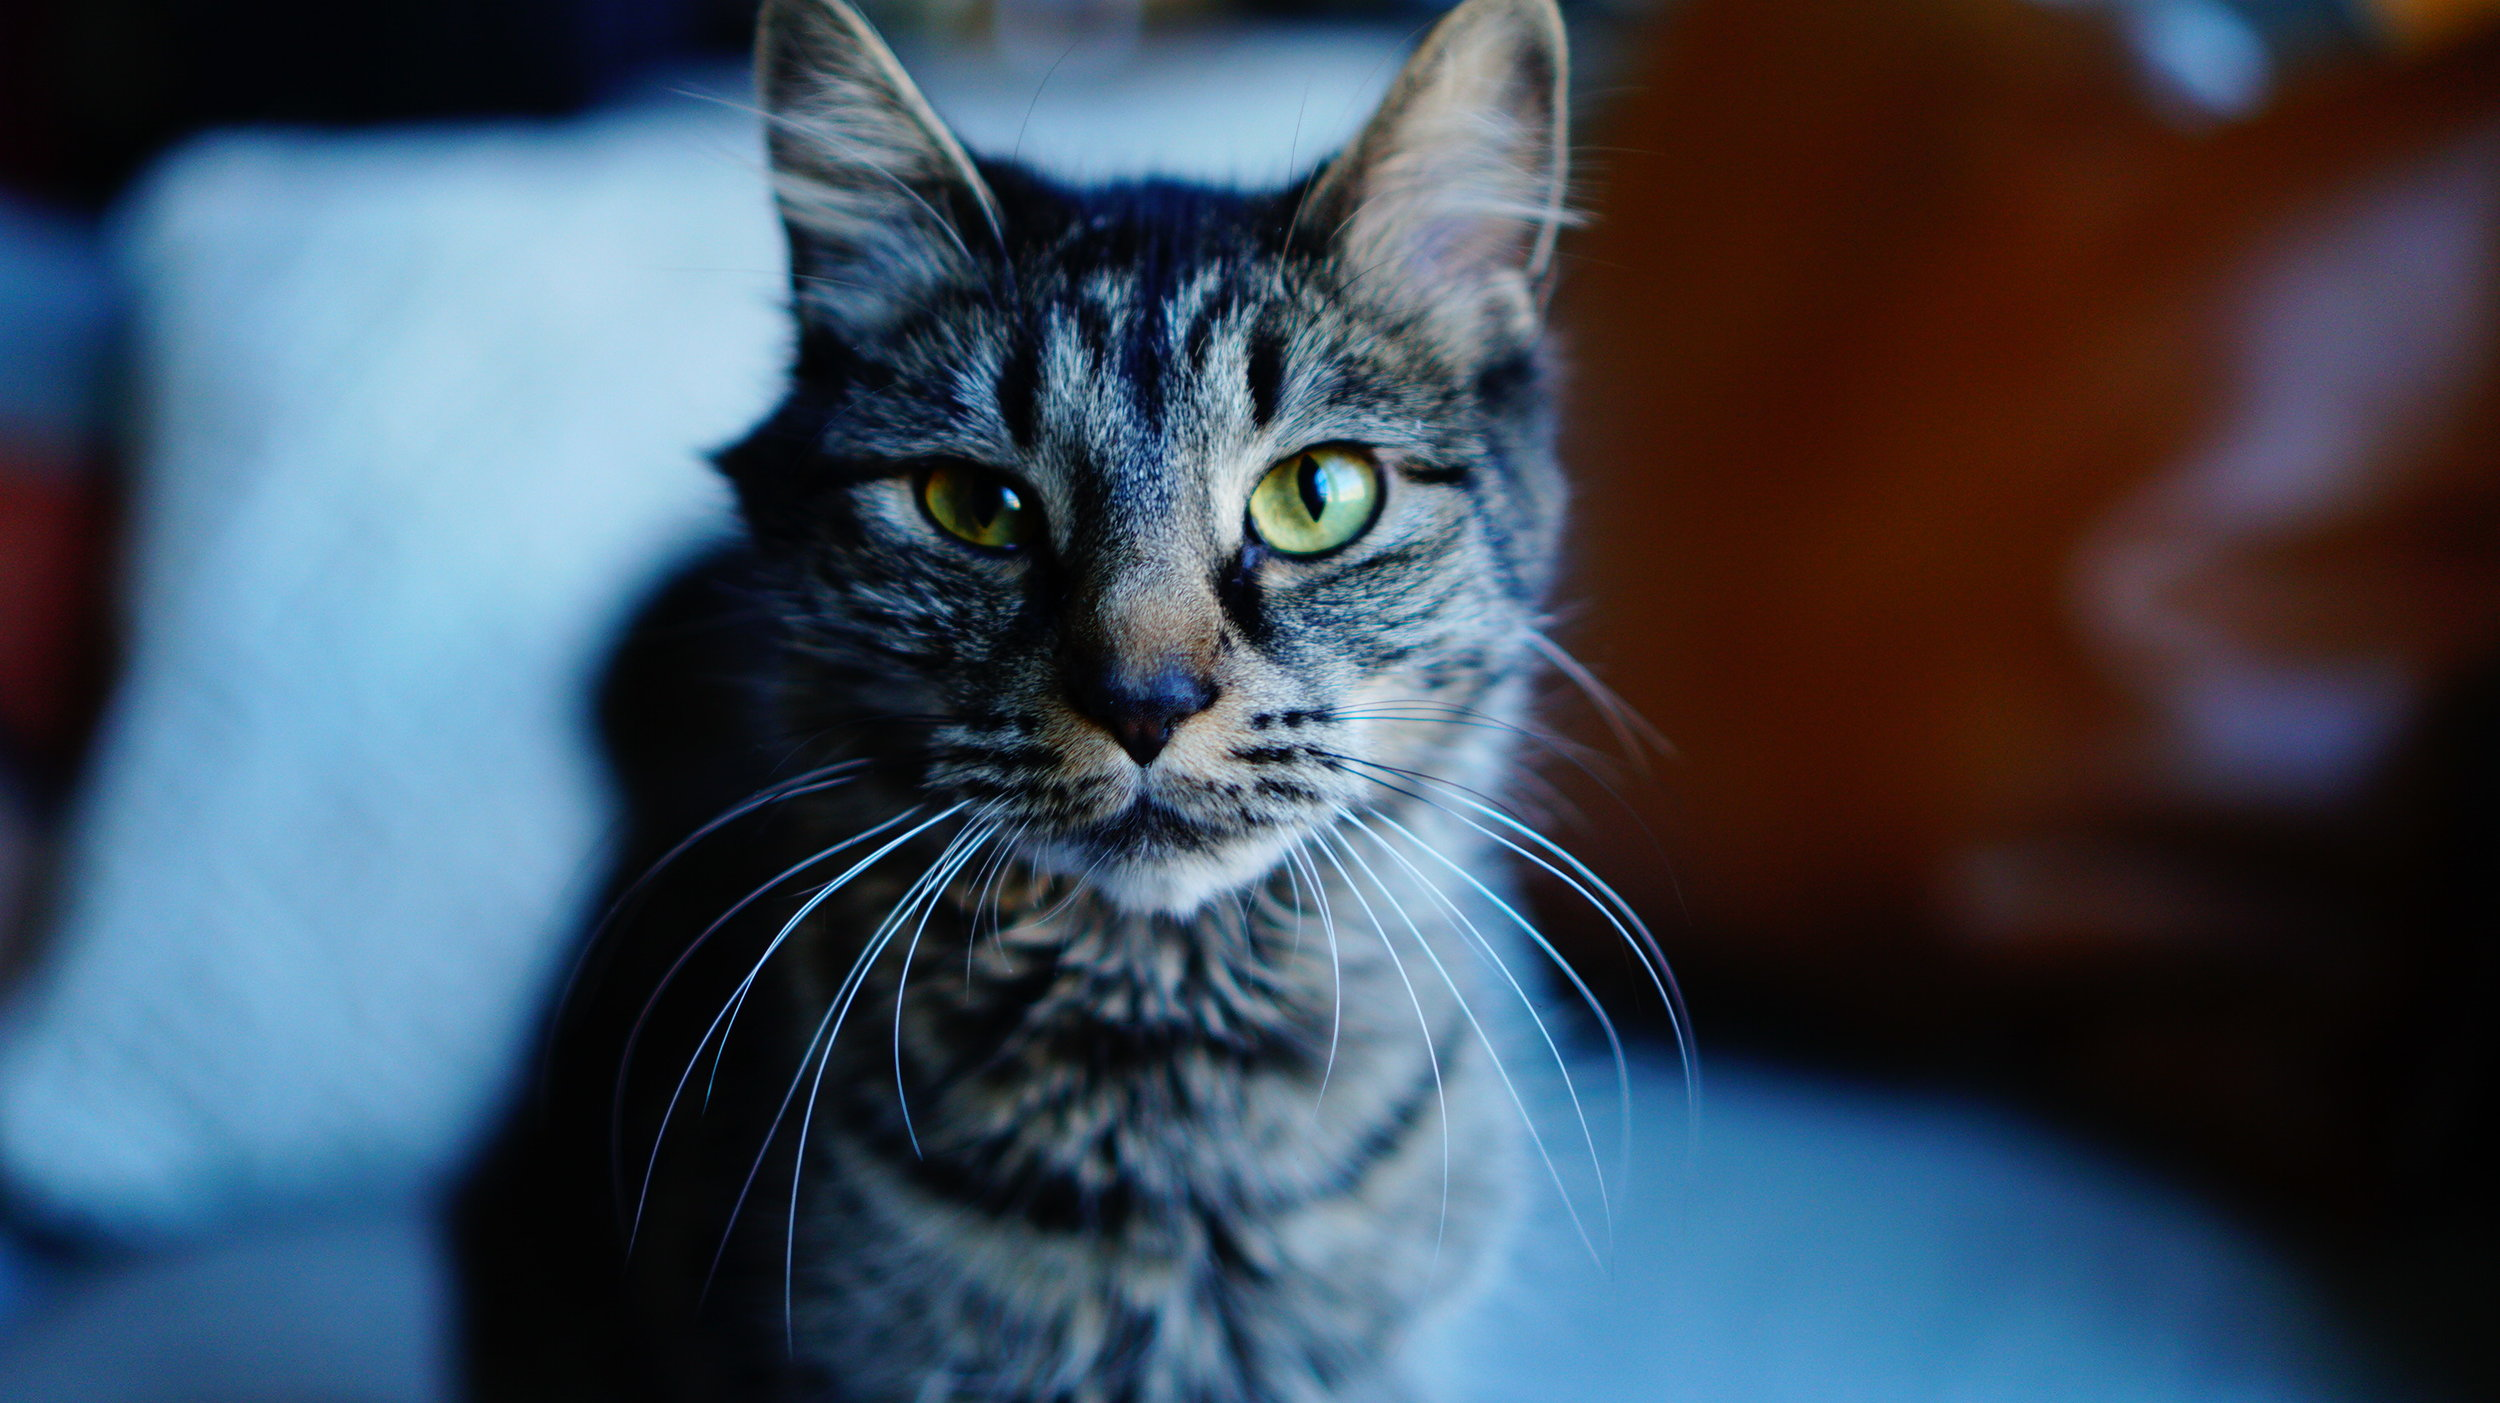 Pet friendlyphoto studio -